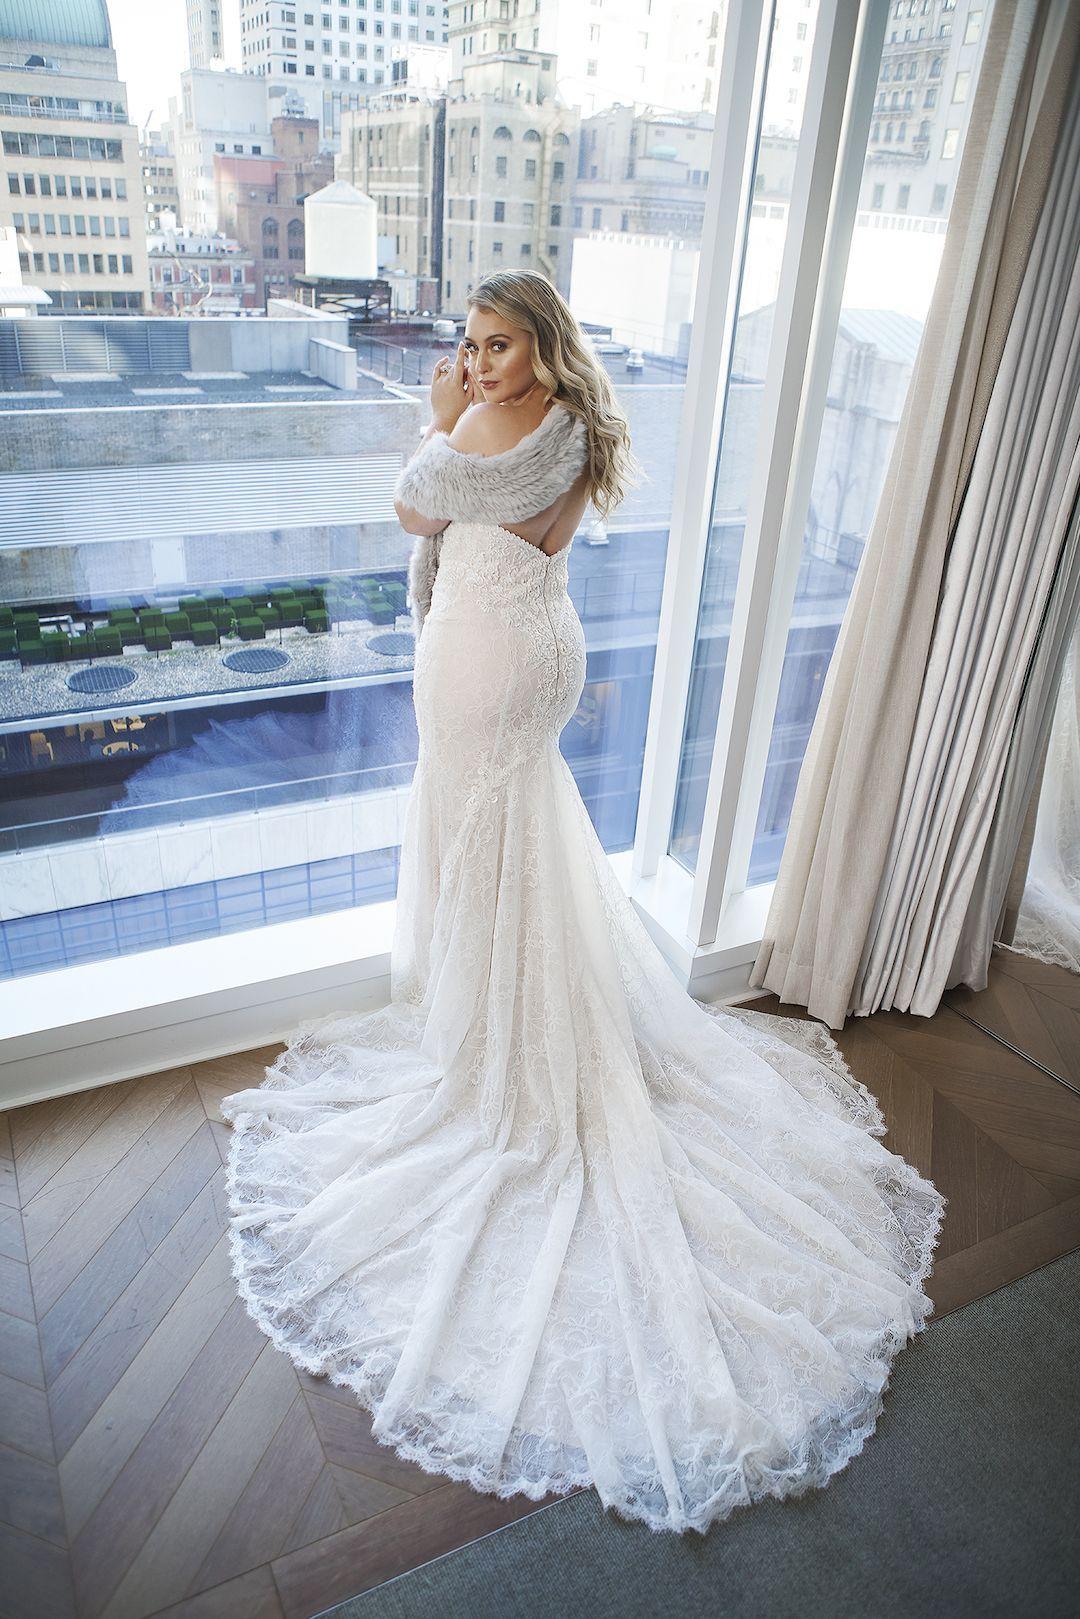 Pin On My Wedding 2019 [ 1619 x 1080 Pixel ]